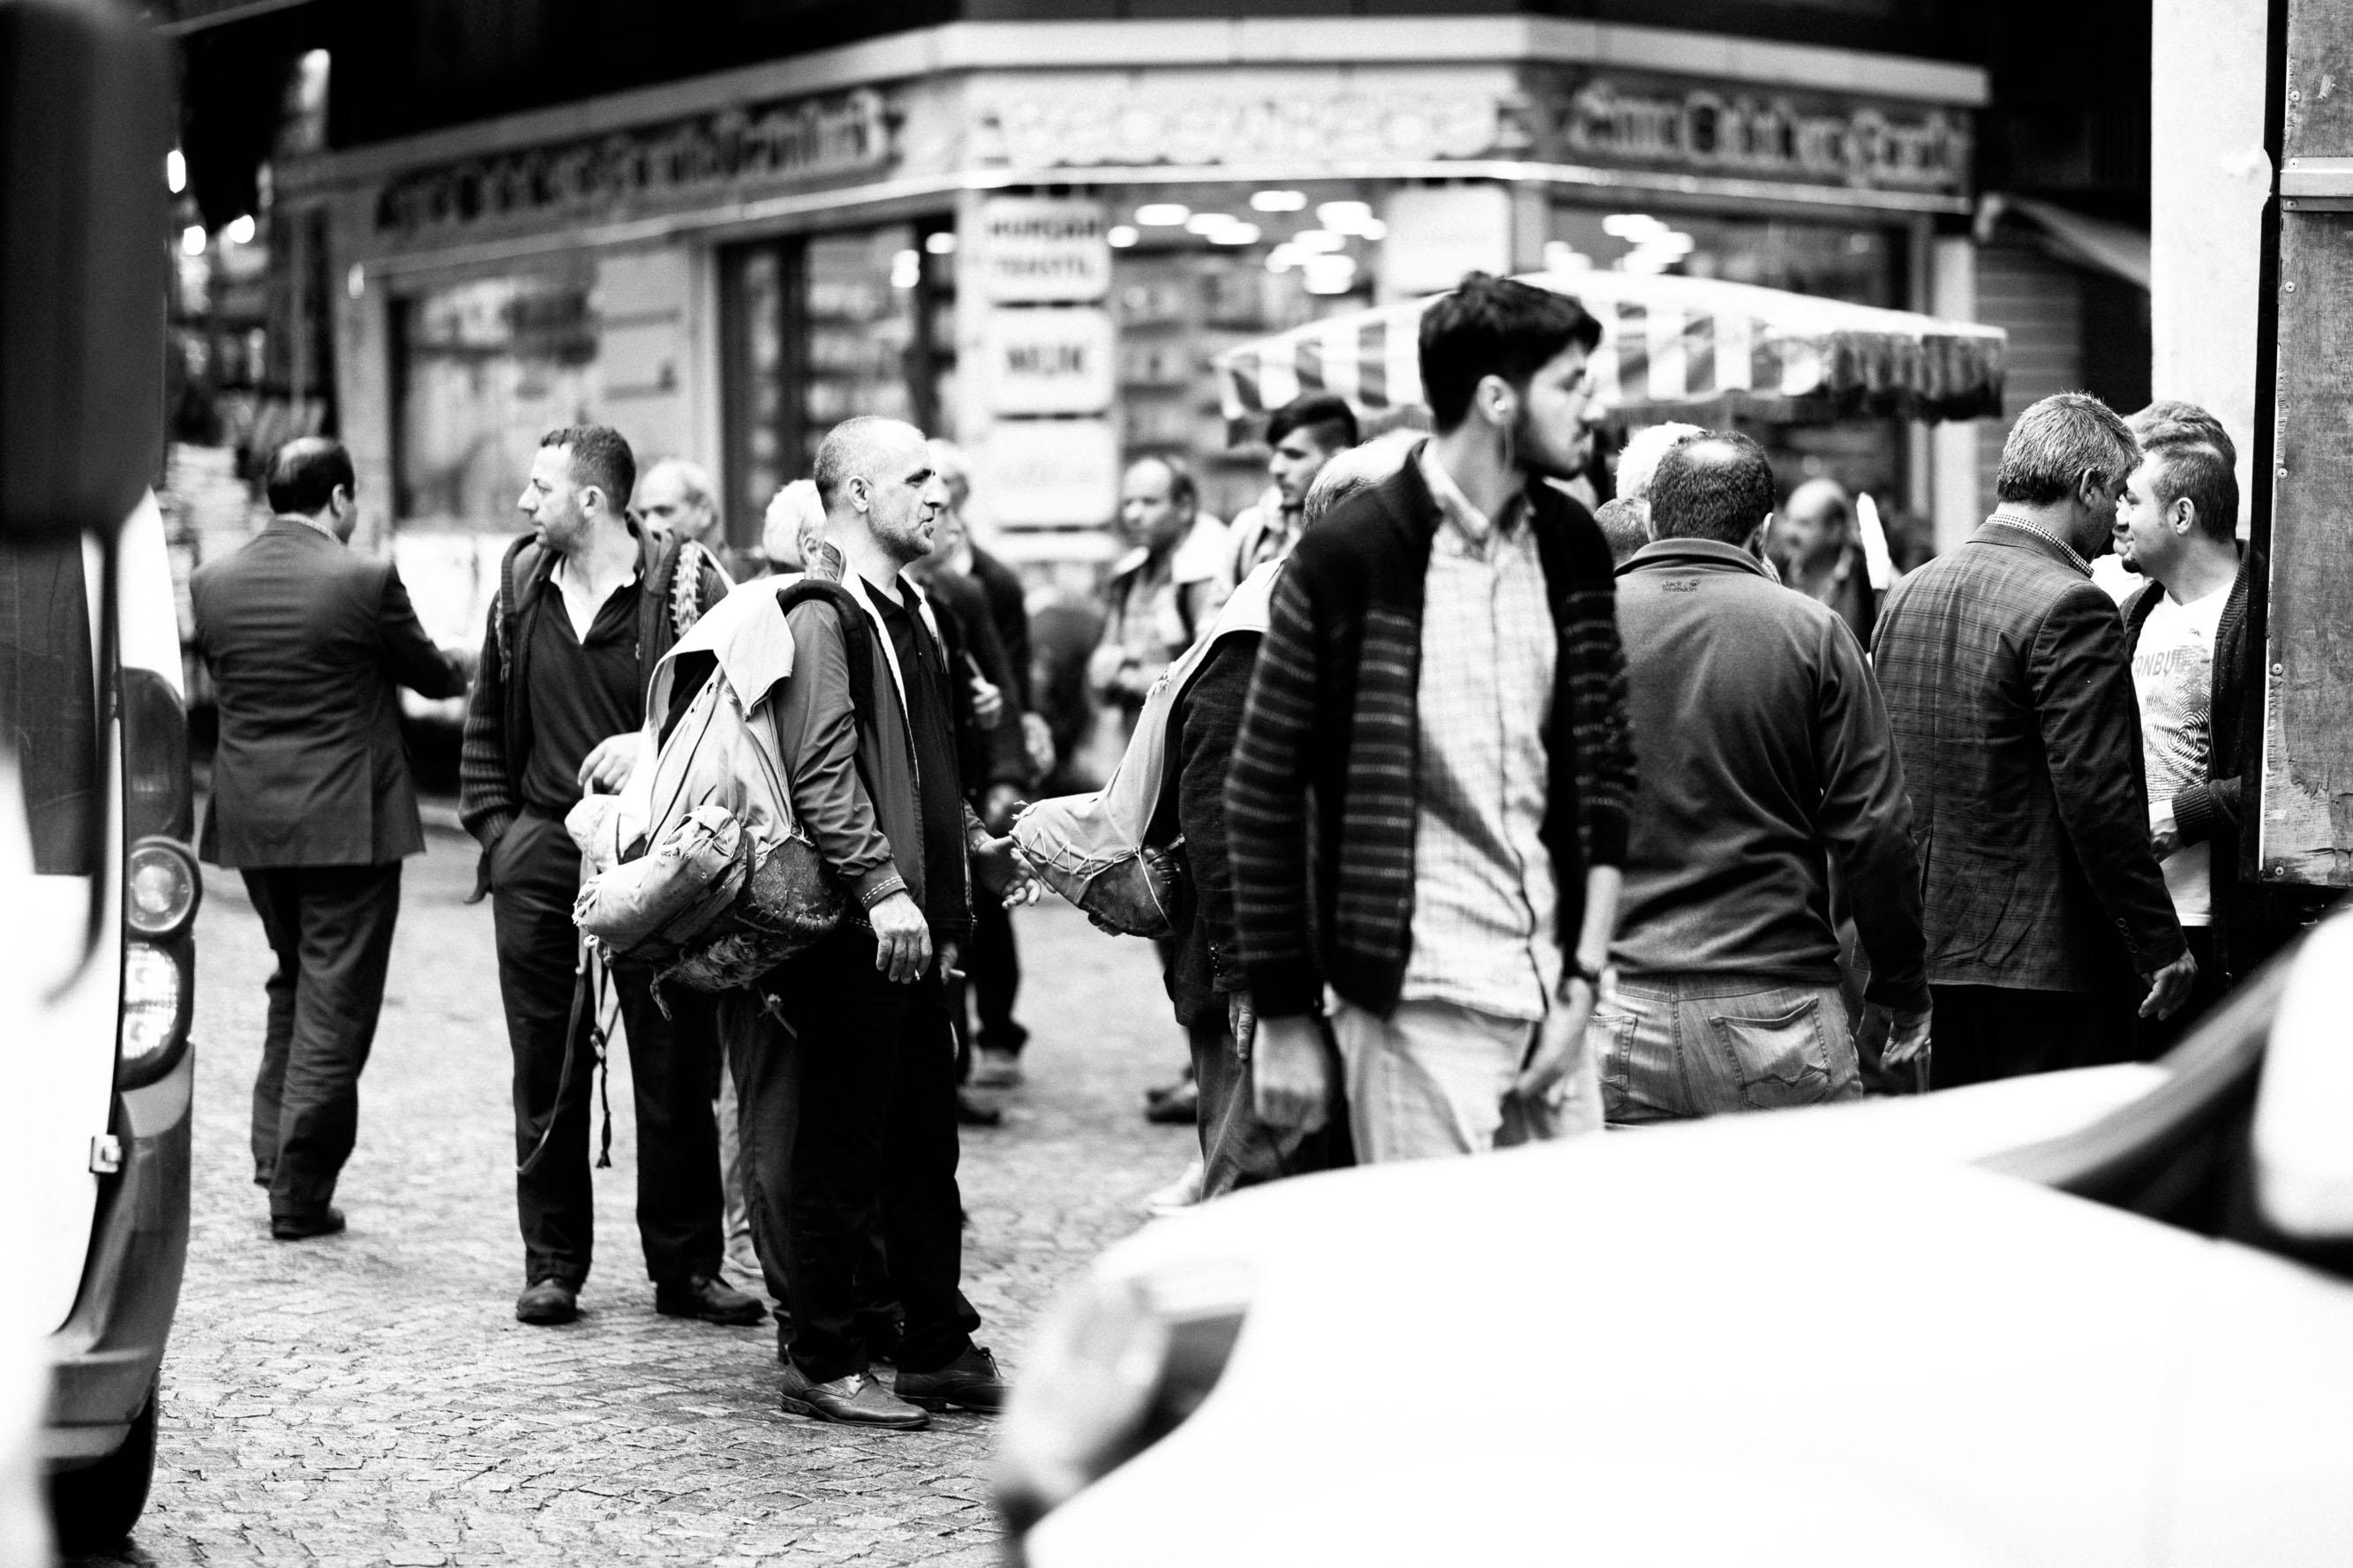 Sven-Michael---S-2018--13-[working-streets]---©-Sven-Michael-Golimowski.jpg